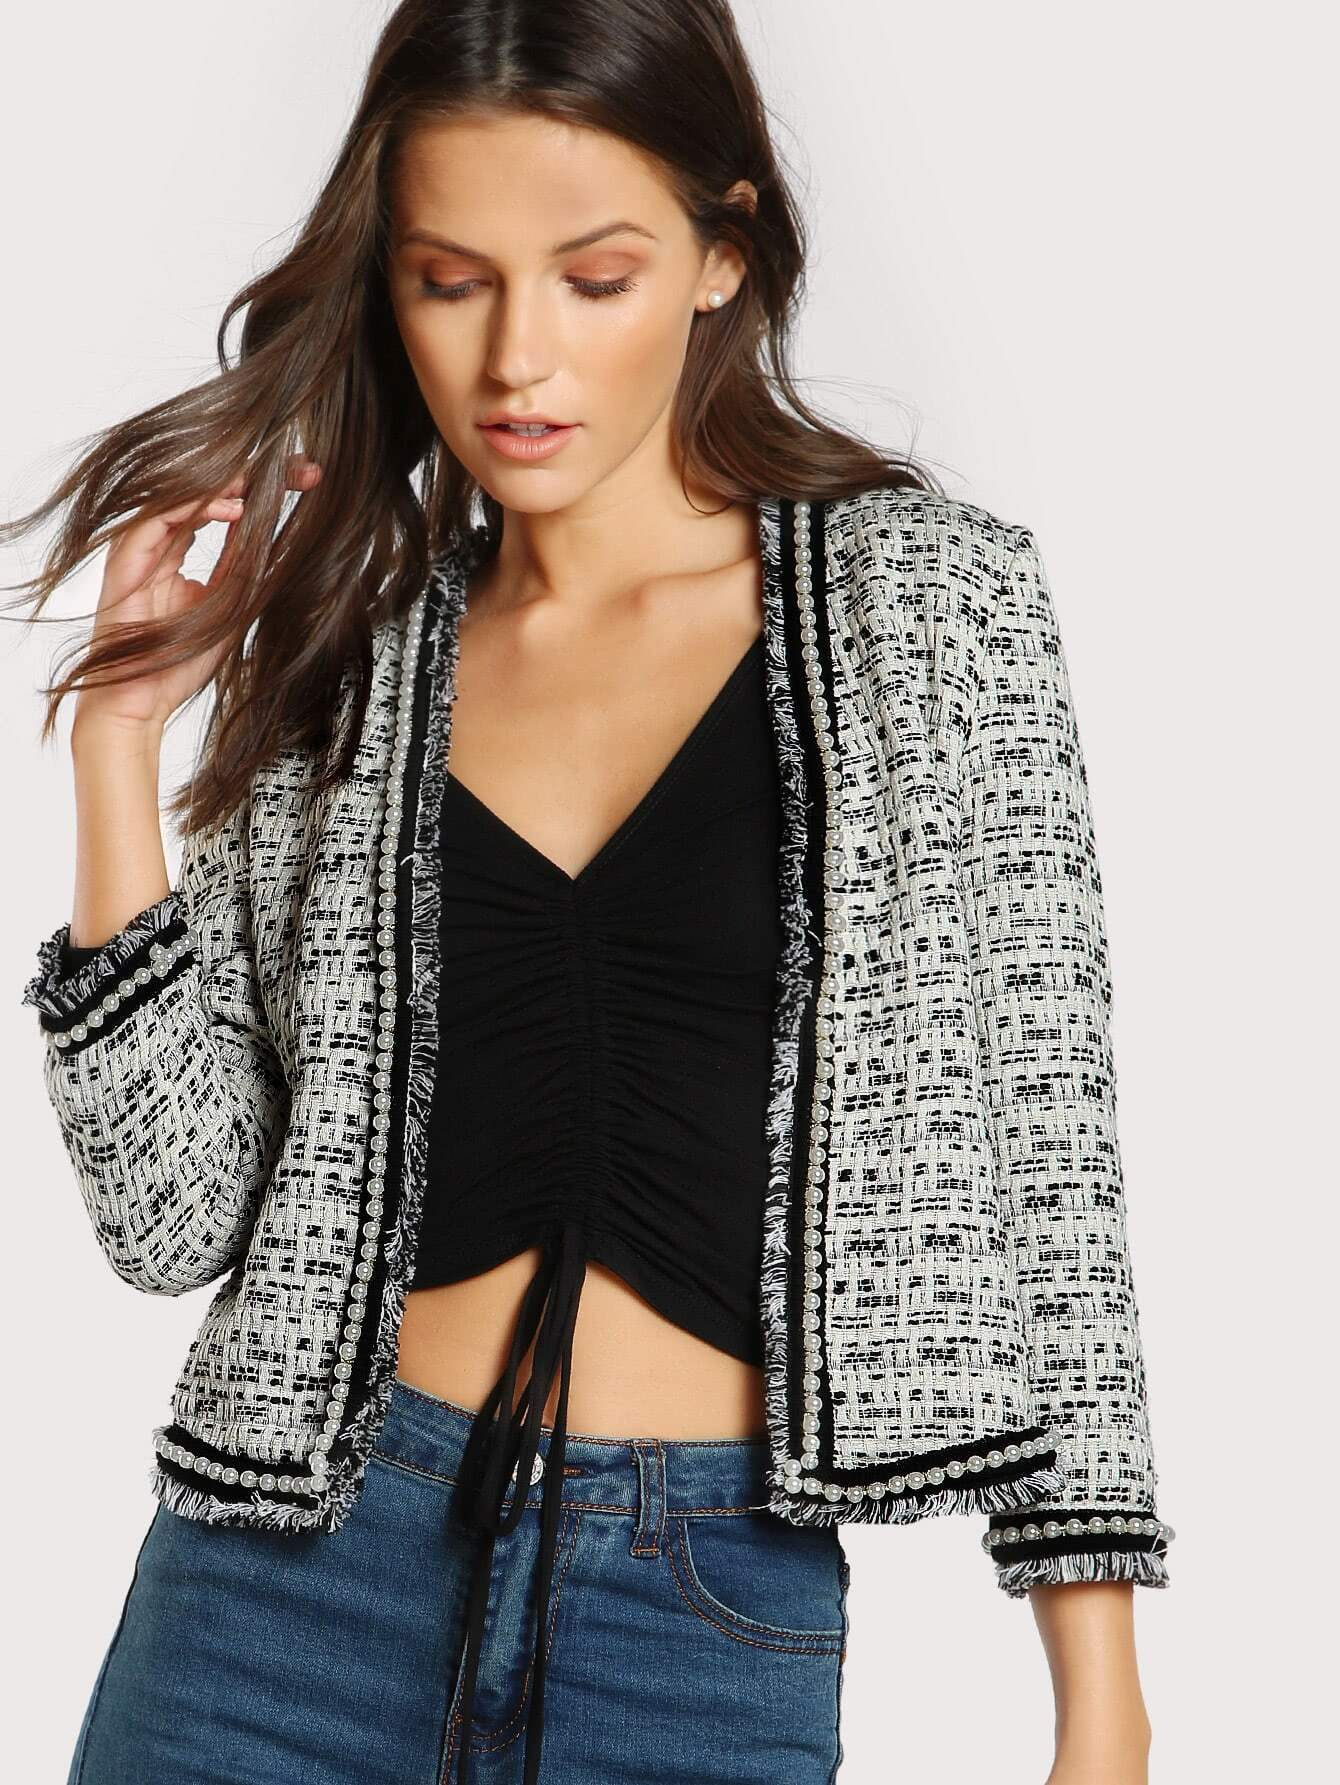 Pearl Beaded Frayed Edge Tweed Blazer rhinestone detail frayed edge tweed skirt